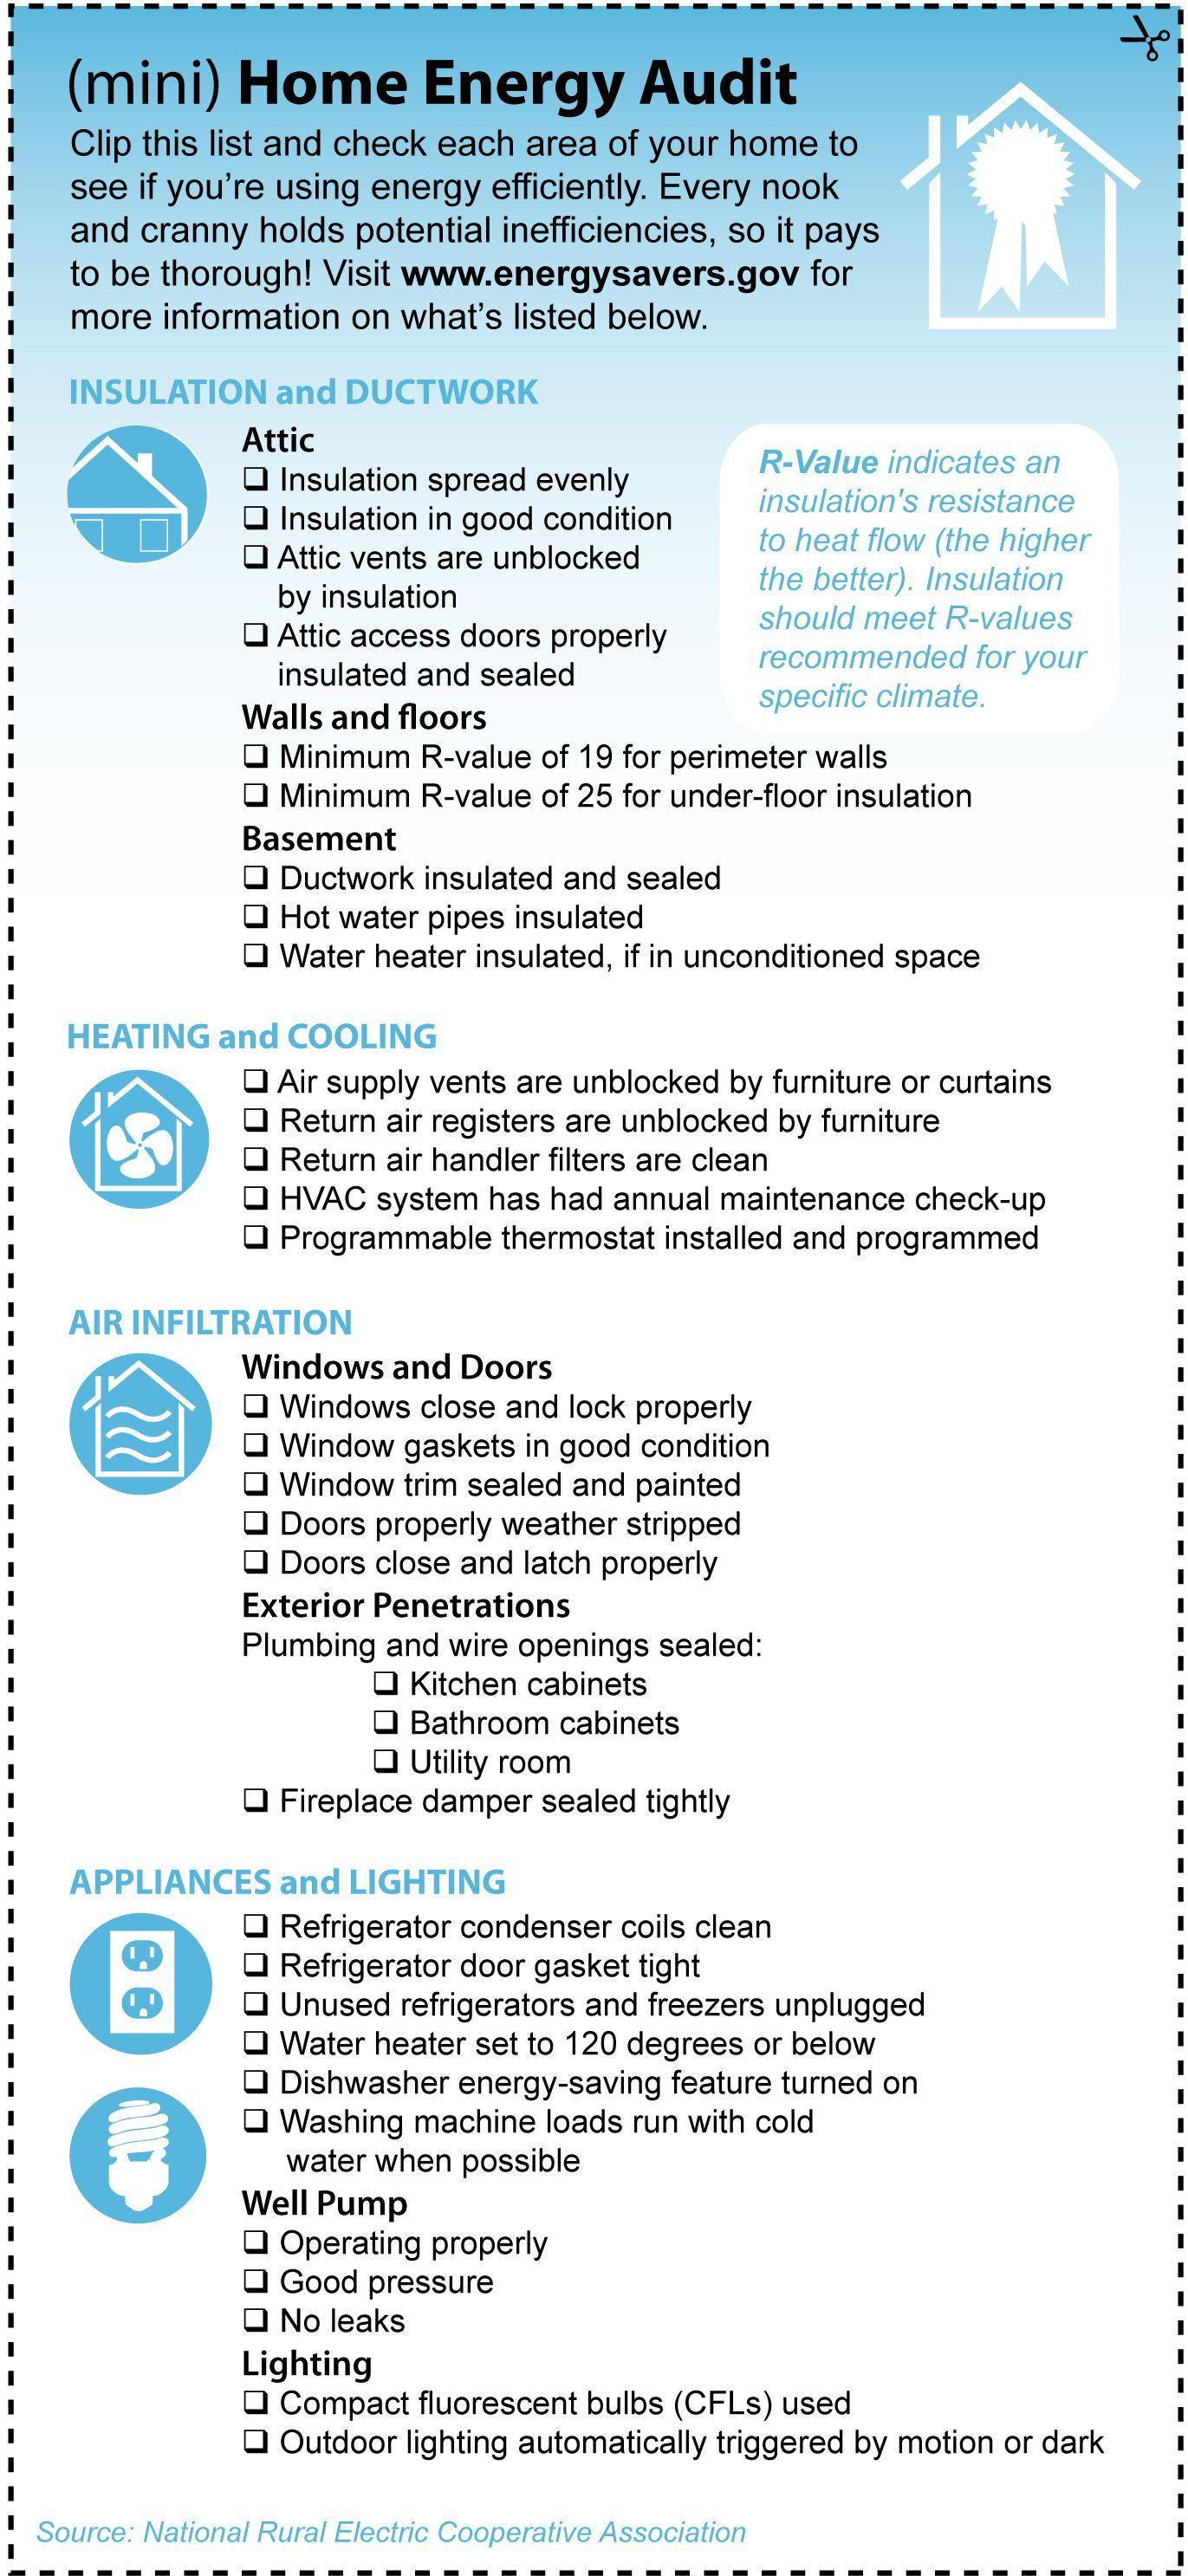 DIY Mini Home Energy Audit | Home Energy Efficiency | Pinterest